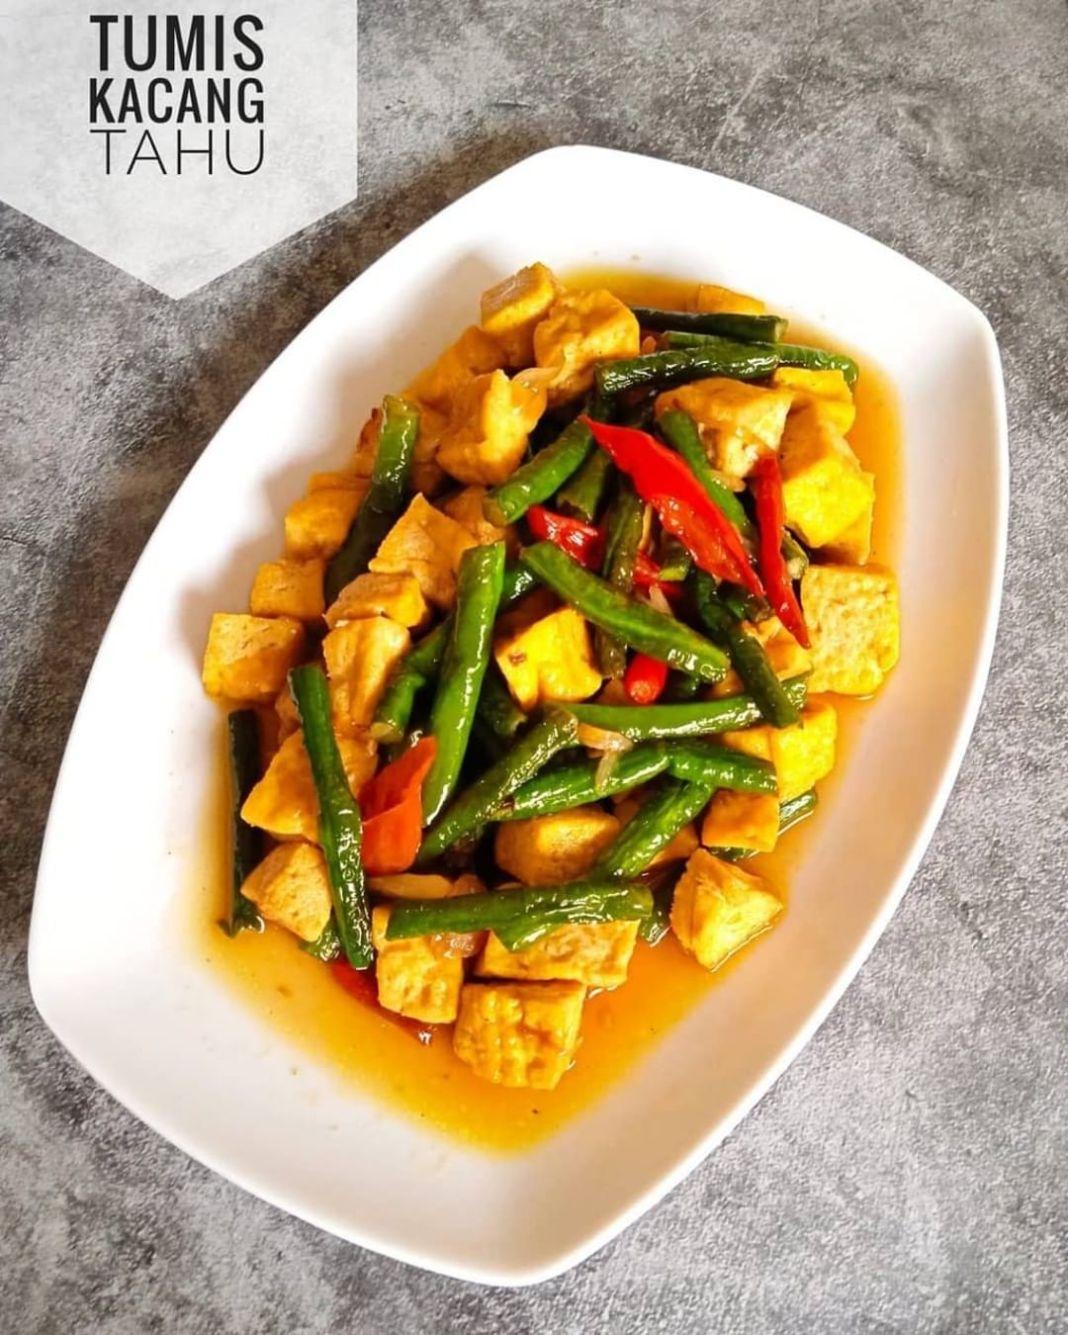 Info kuliner, TUMIS KACANG TAHU•  -5 buah tahu kuning (potong dadu, goreng kering) -2 cabai merah keriting (i…